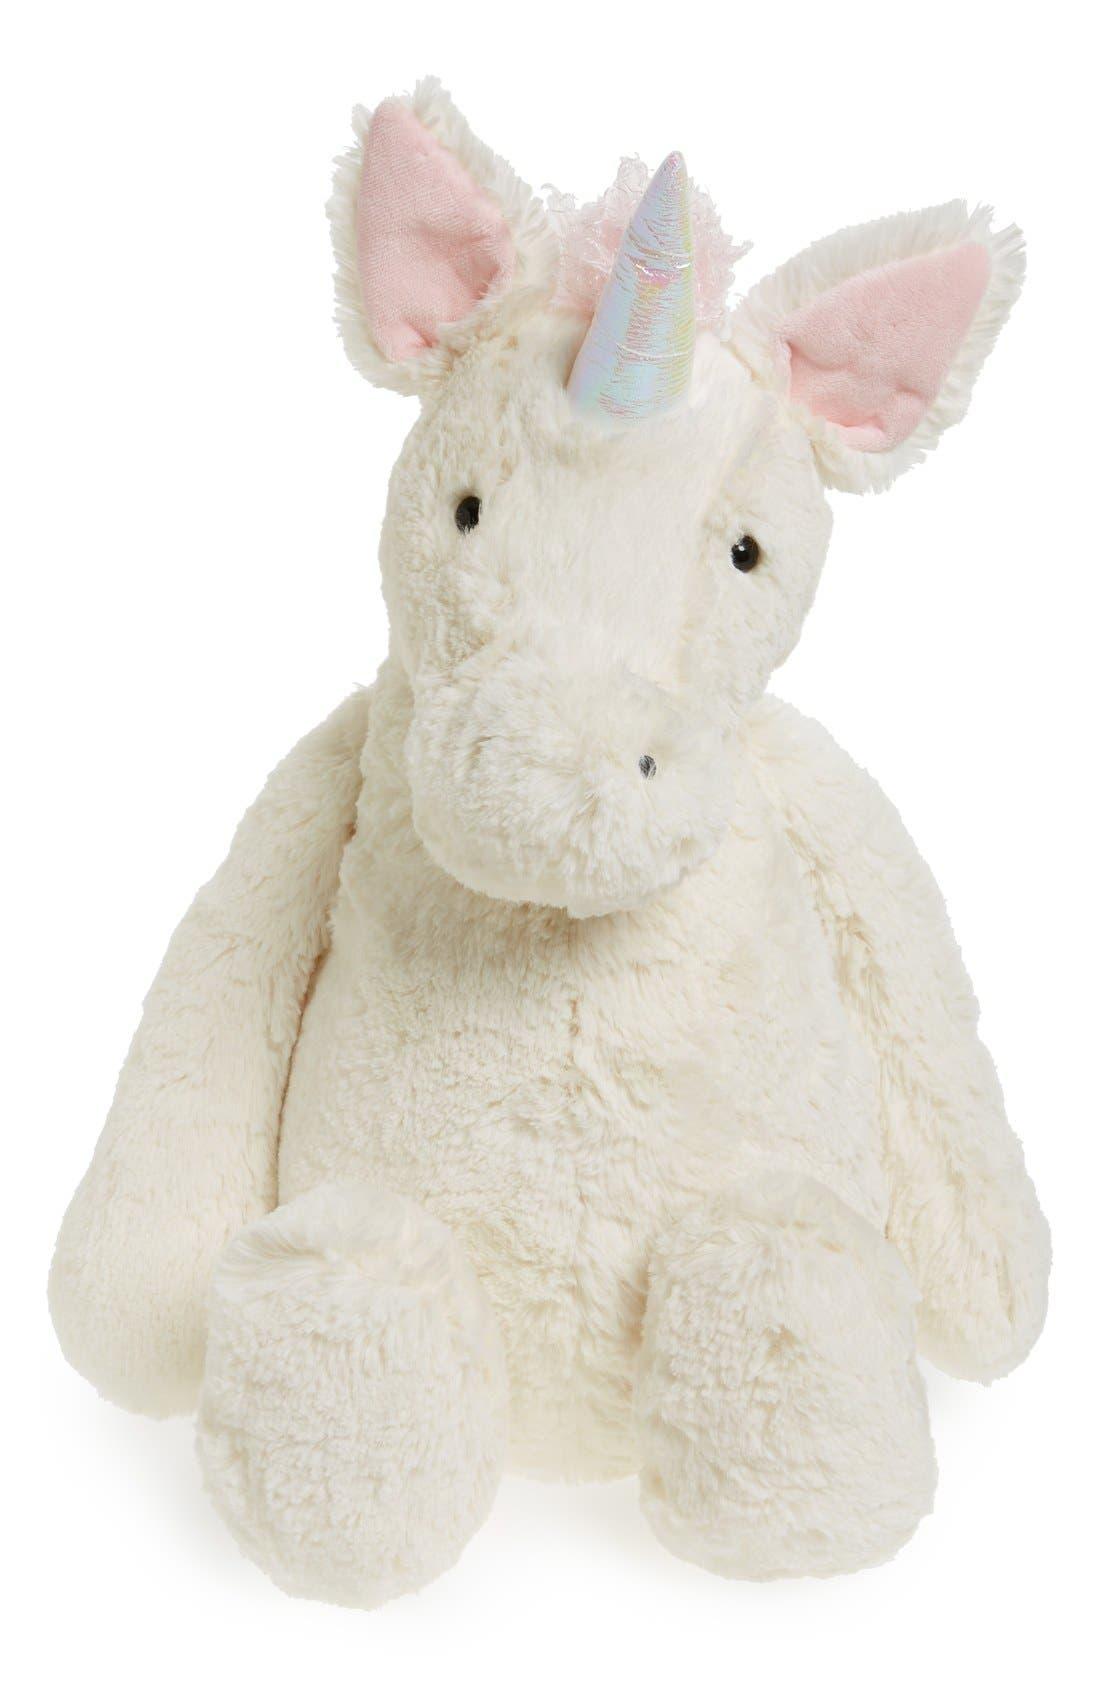 'Huge Bashful Unicorn' Stuffed Animal,                             Main thumbnail 1, color,                             CREAM